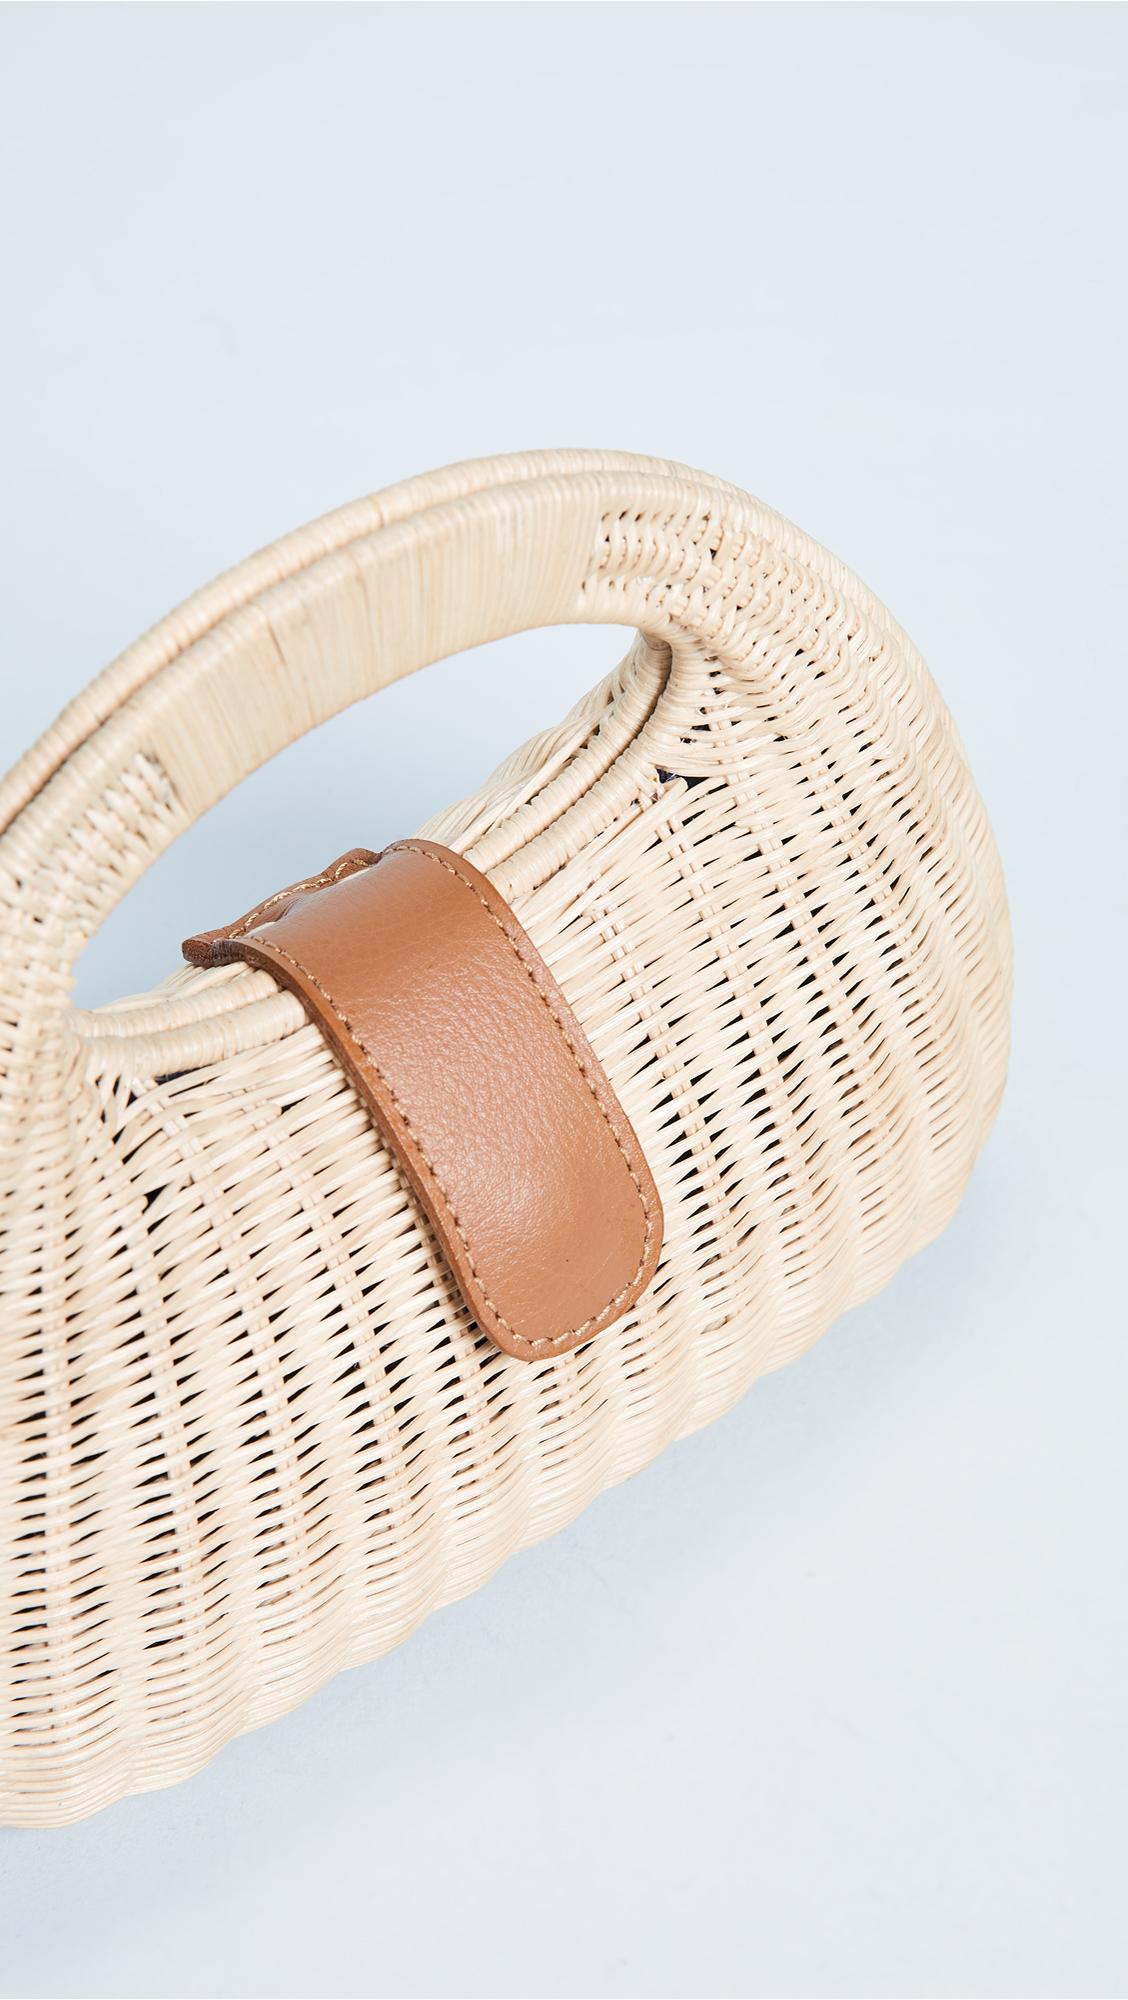 Mandy Wicker Basket Bag Rocio Footlocker Pictures Online Free Shipping Latest Clearance Best vfSjVDn5